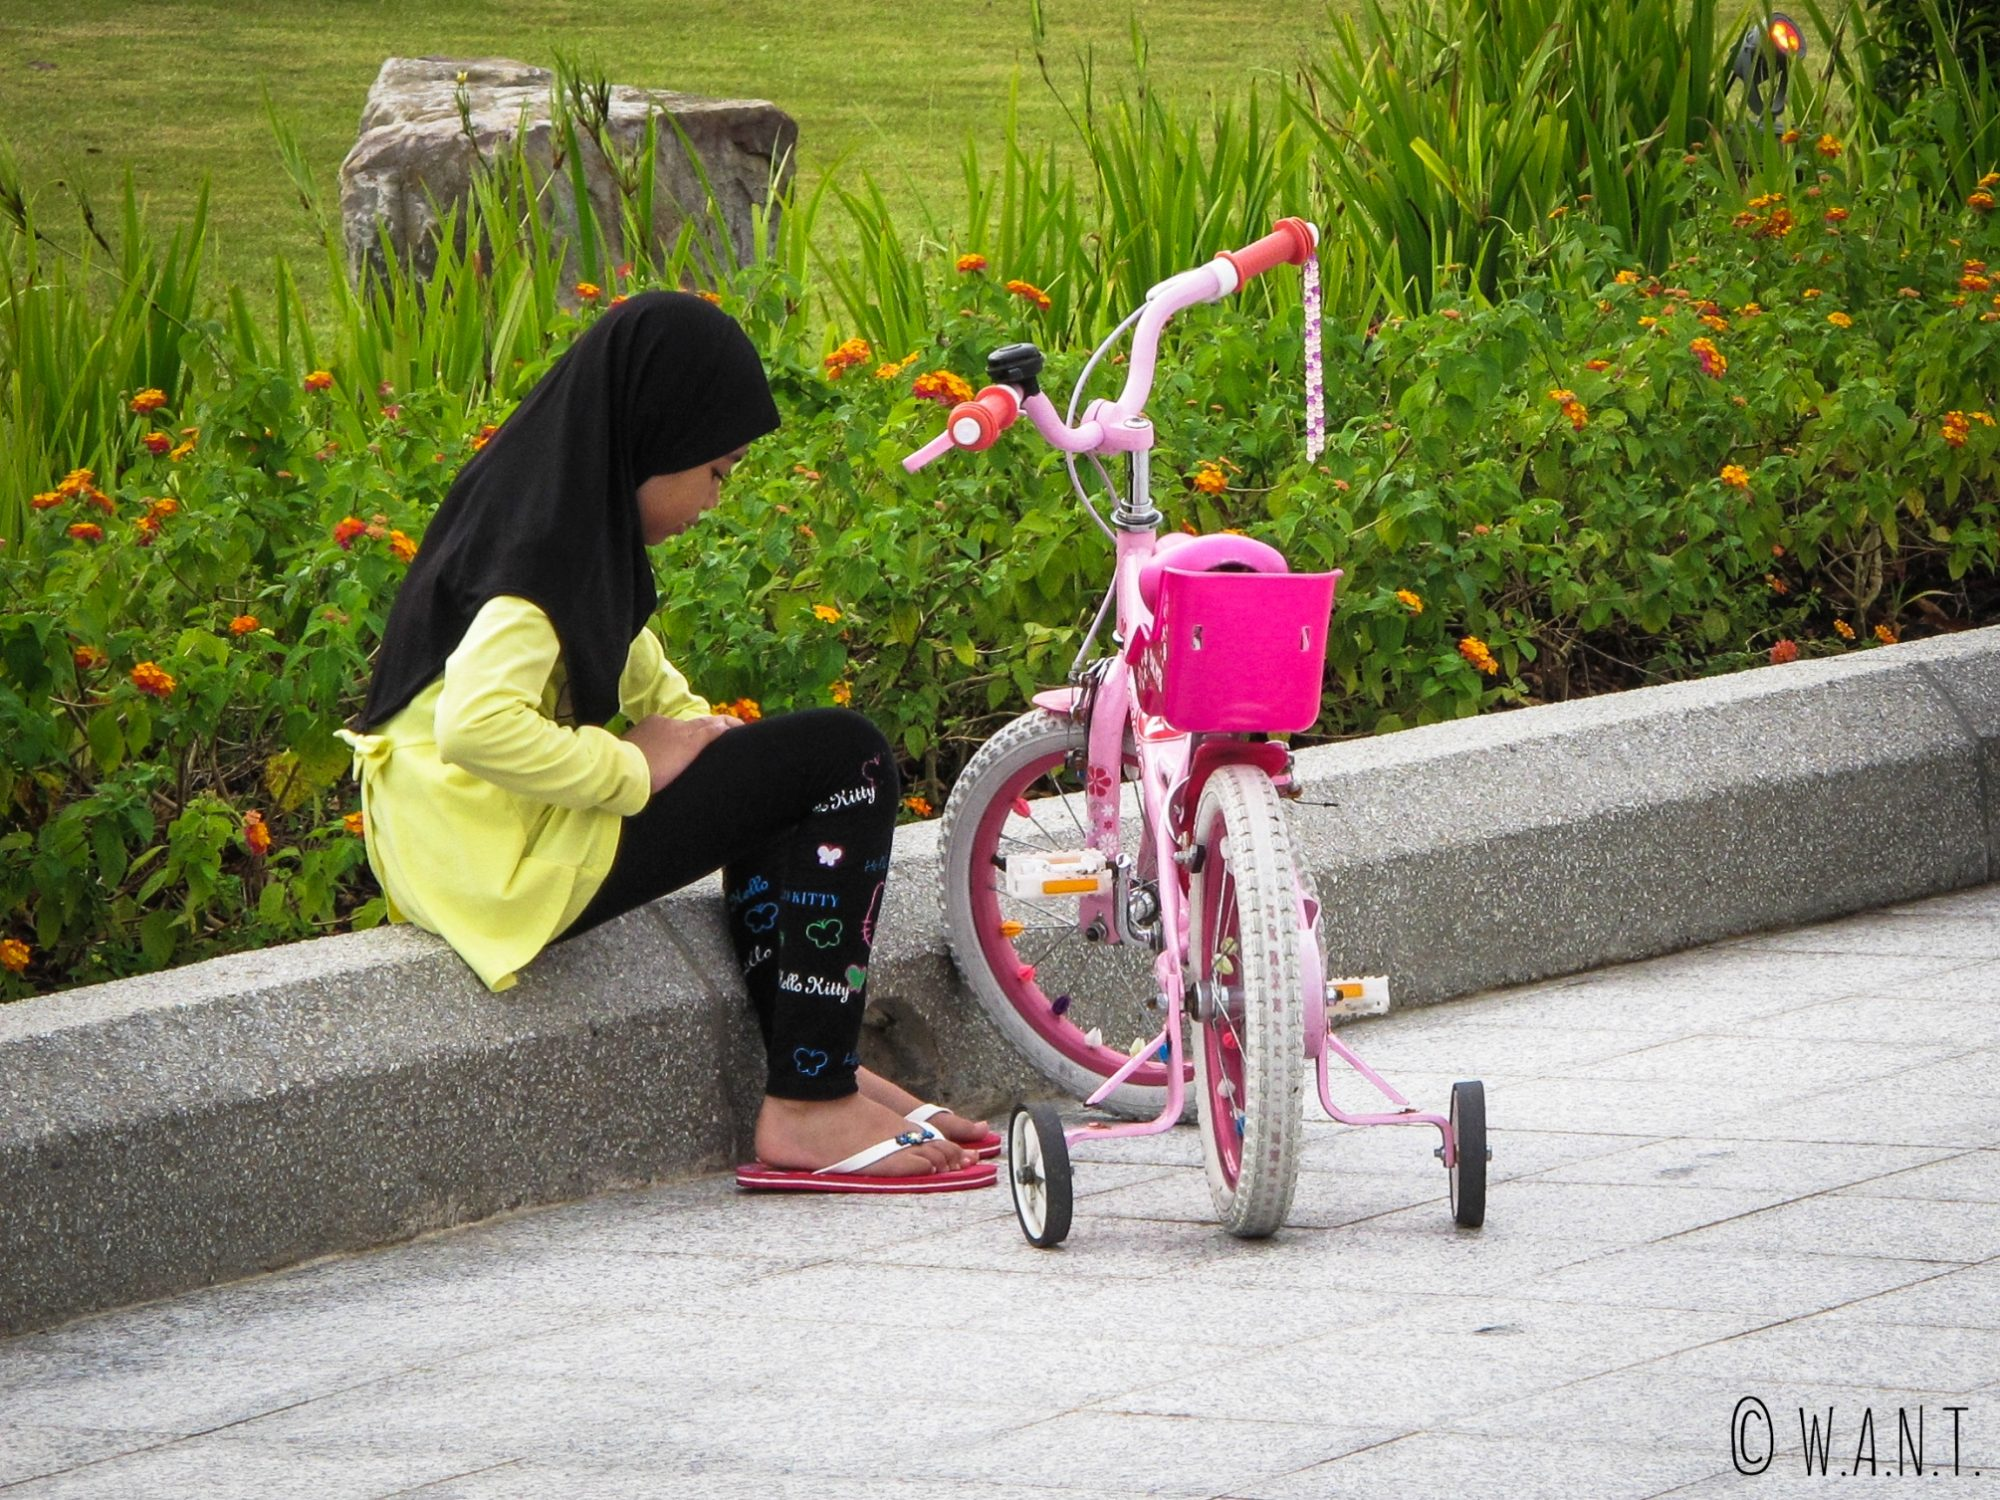 Filette et son vélo dans le parc Taman Mahkota Jubli Emas de Bandar Seri Begawan